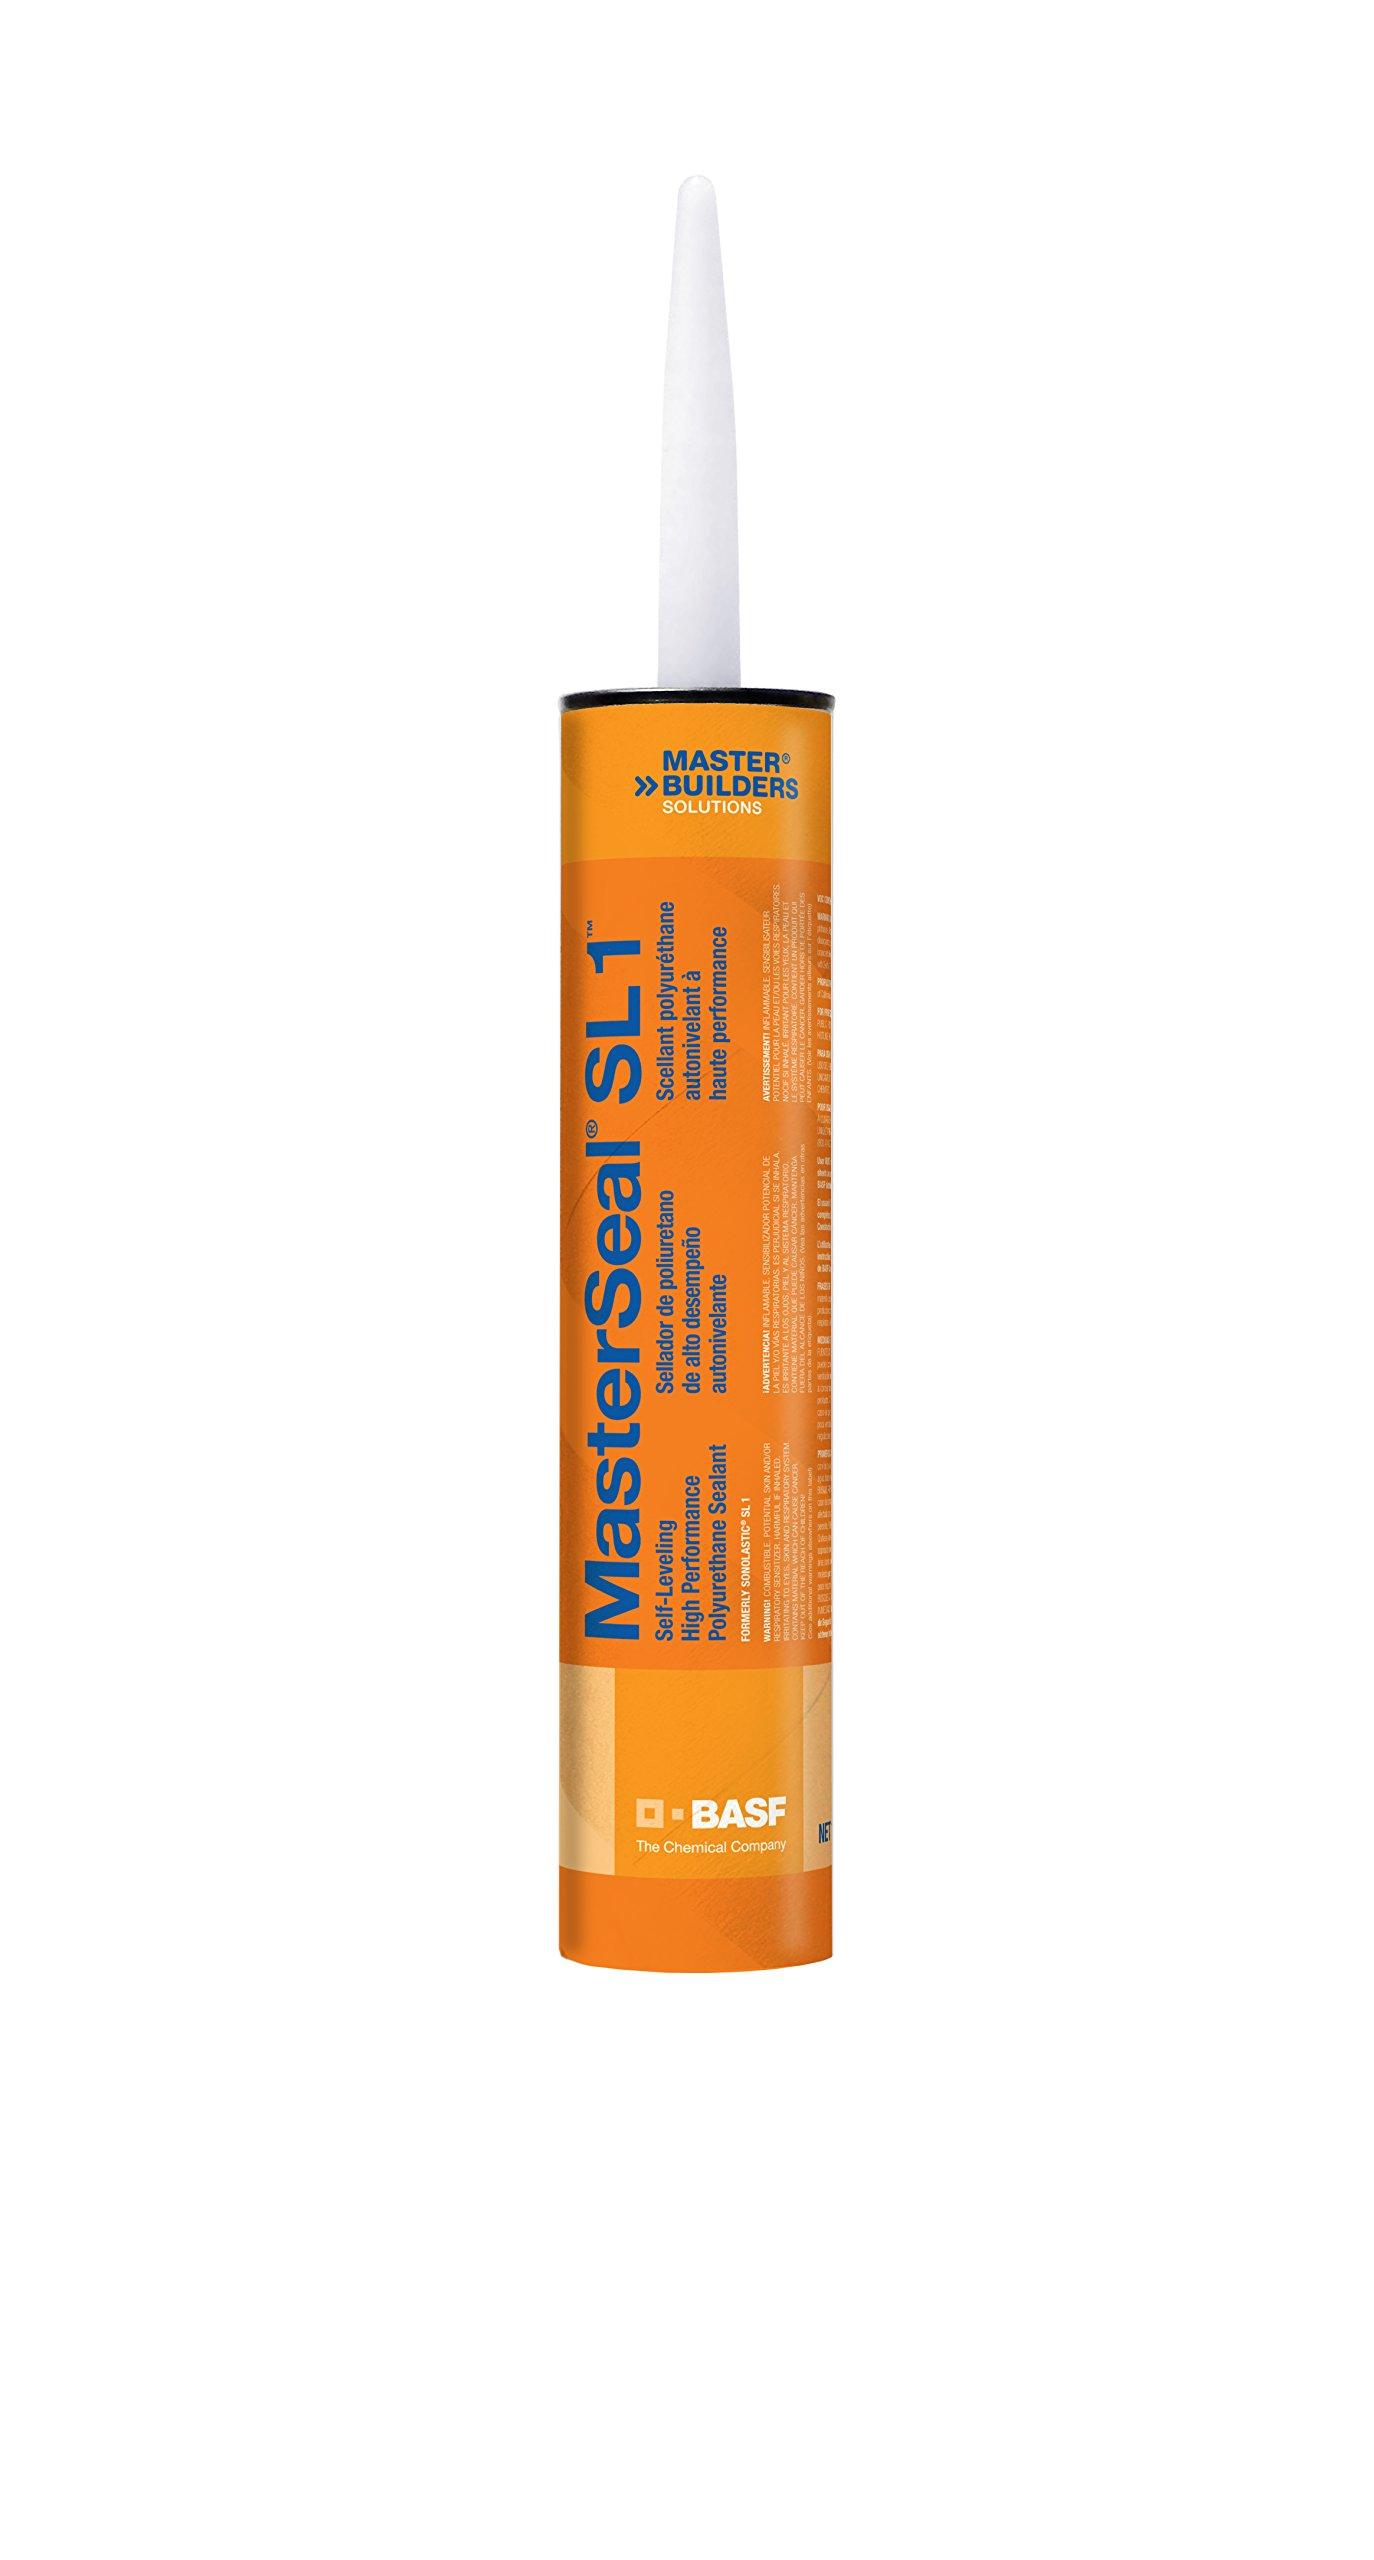 MasterSeal SL 1 - Quantity of 6 Quart Cartridges (Gray)